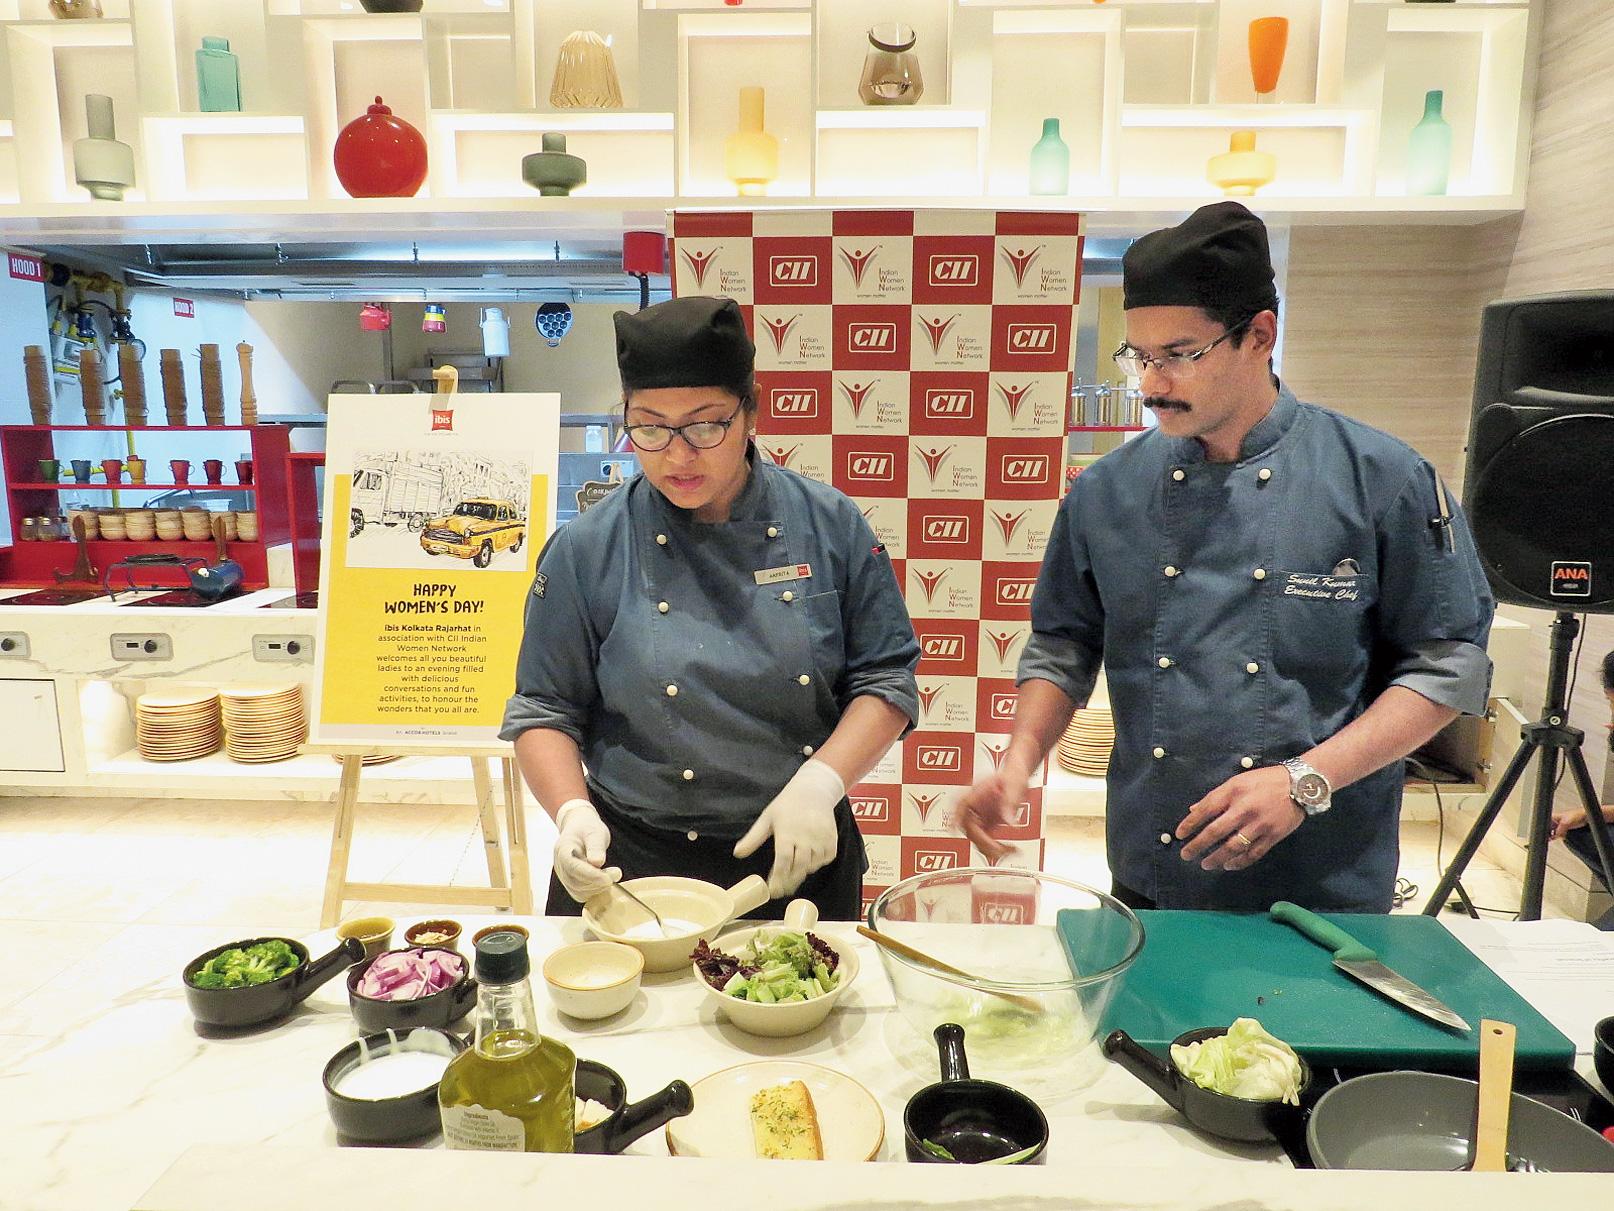 Chef Arpita Roy busy in the kitchen under the supervision of Sunil Kumar Gopalan, executive chef, Ibis Kolkata Rajarhat.